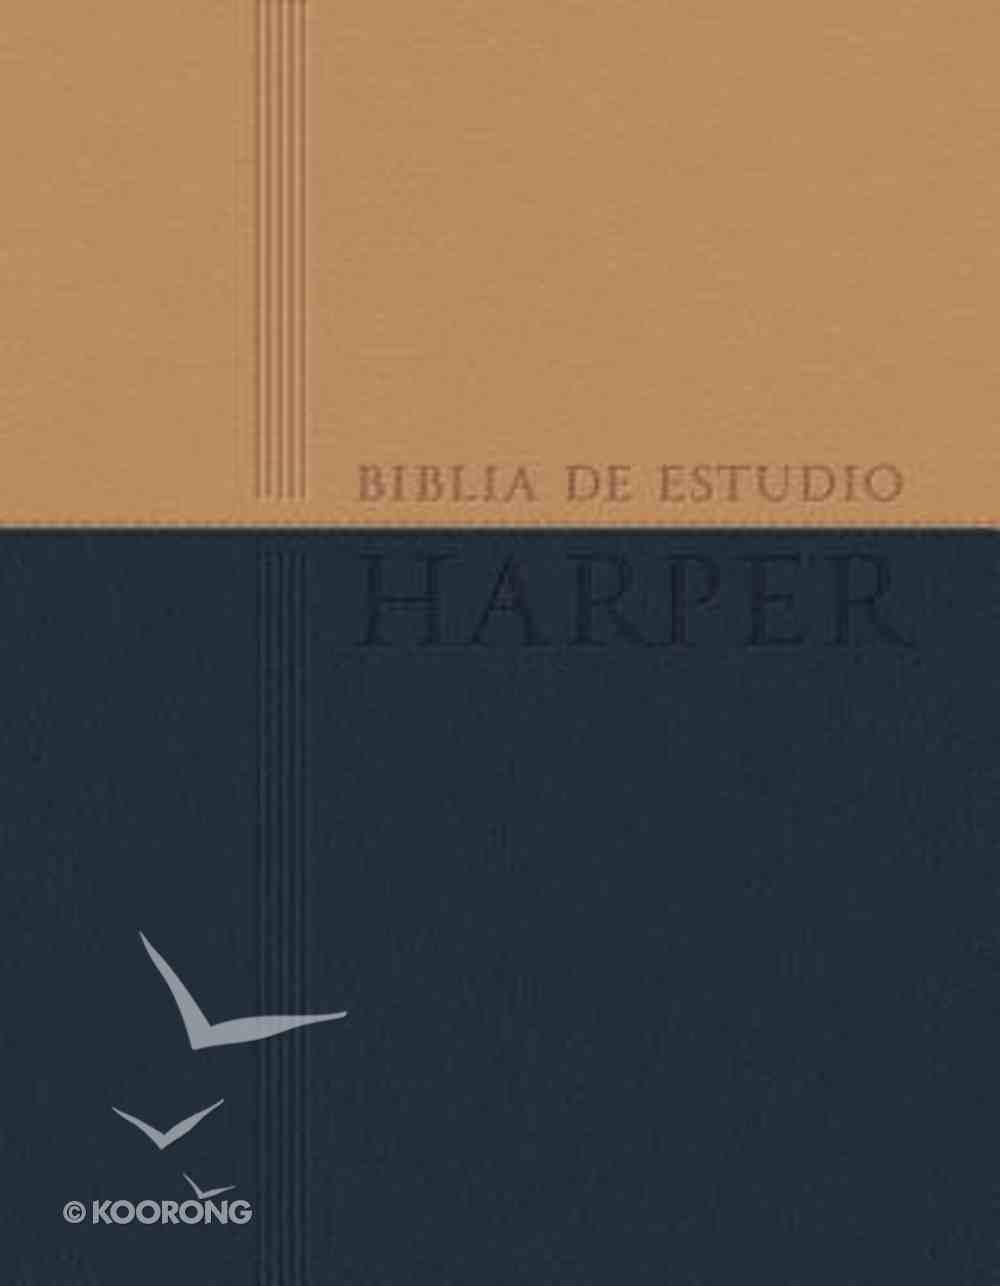 Rvr 1960 Biblia De Estudio Harper Brown/Navy (Red Letter Edition) (Harper Study Bible) Premium Imitation Leather